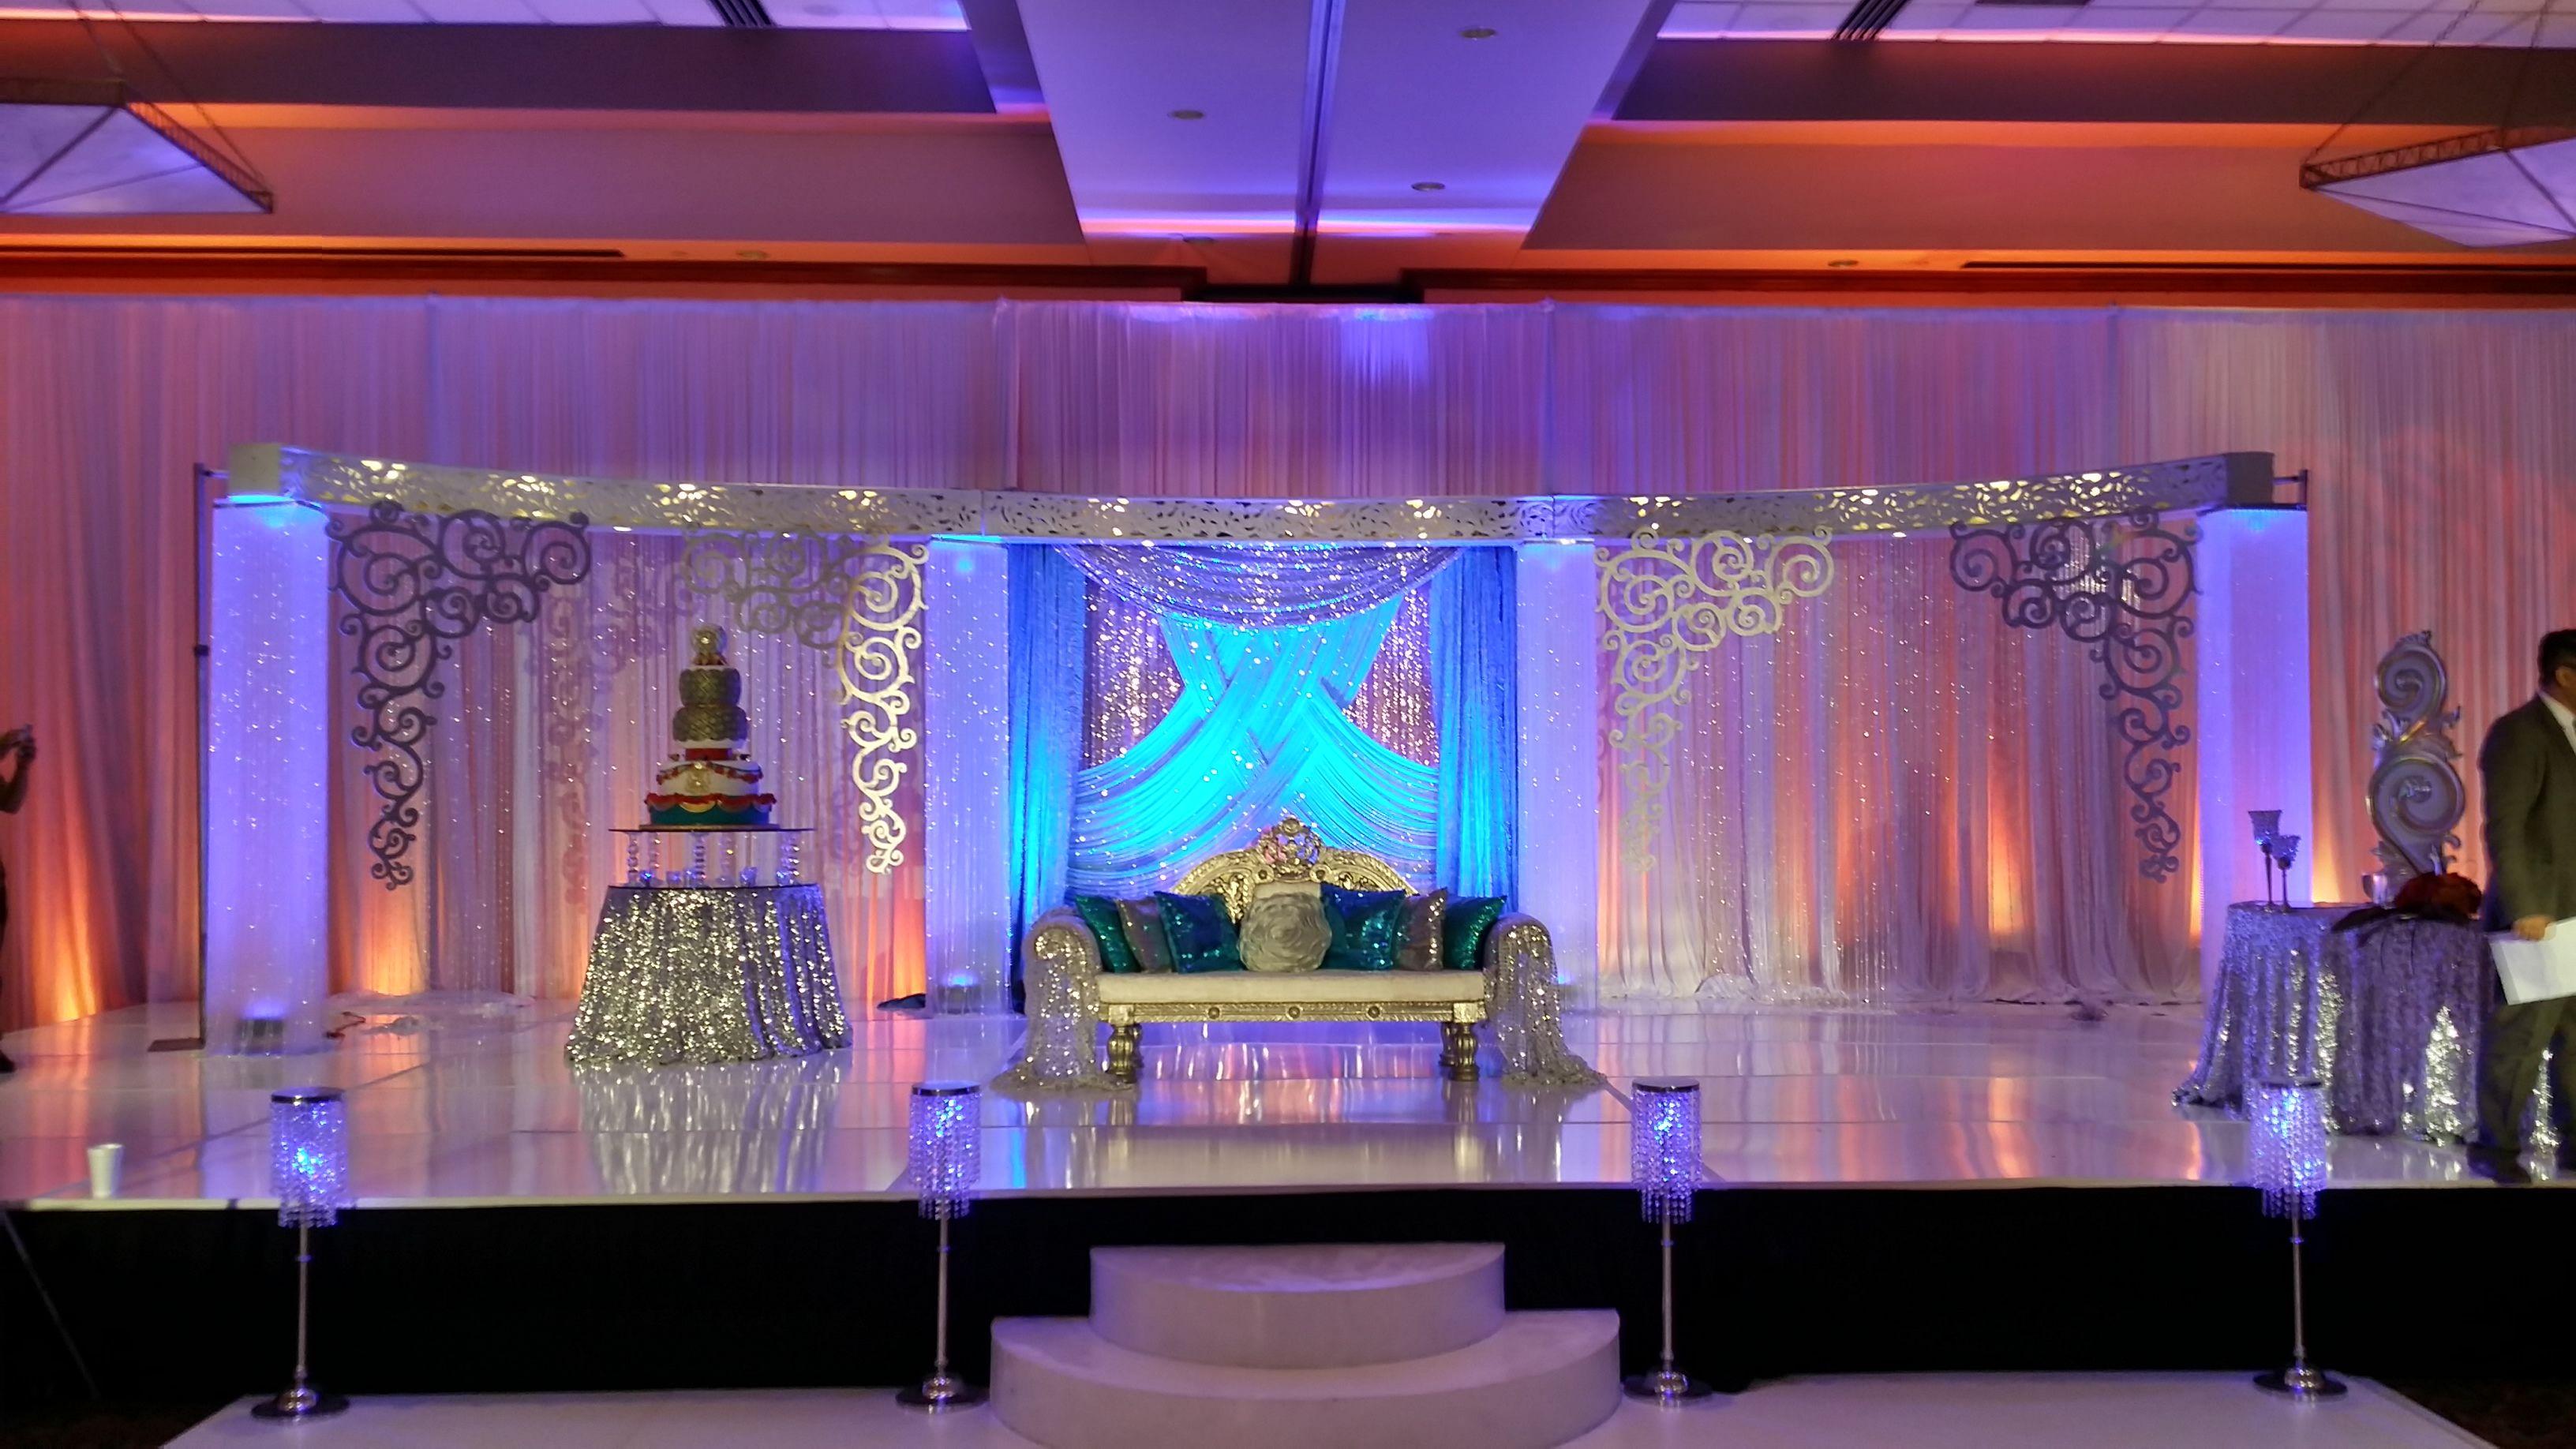 Wedding stage decoration with balloons  Weddings by Farah  wedding decor  Pinterest  Weddings and Wedding